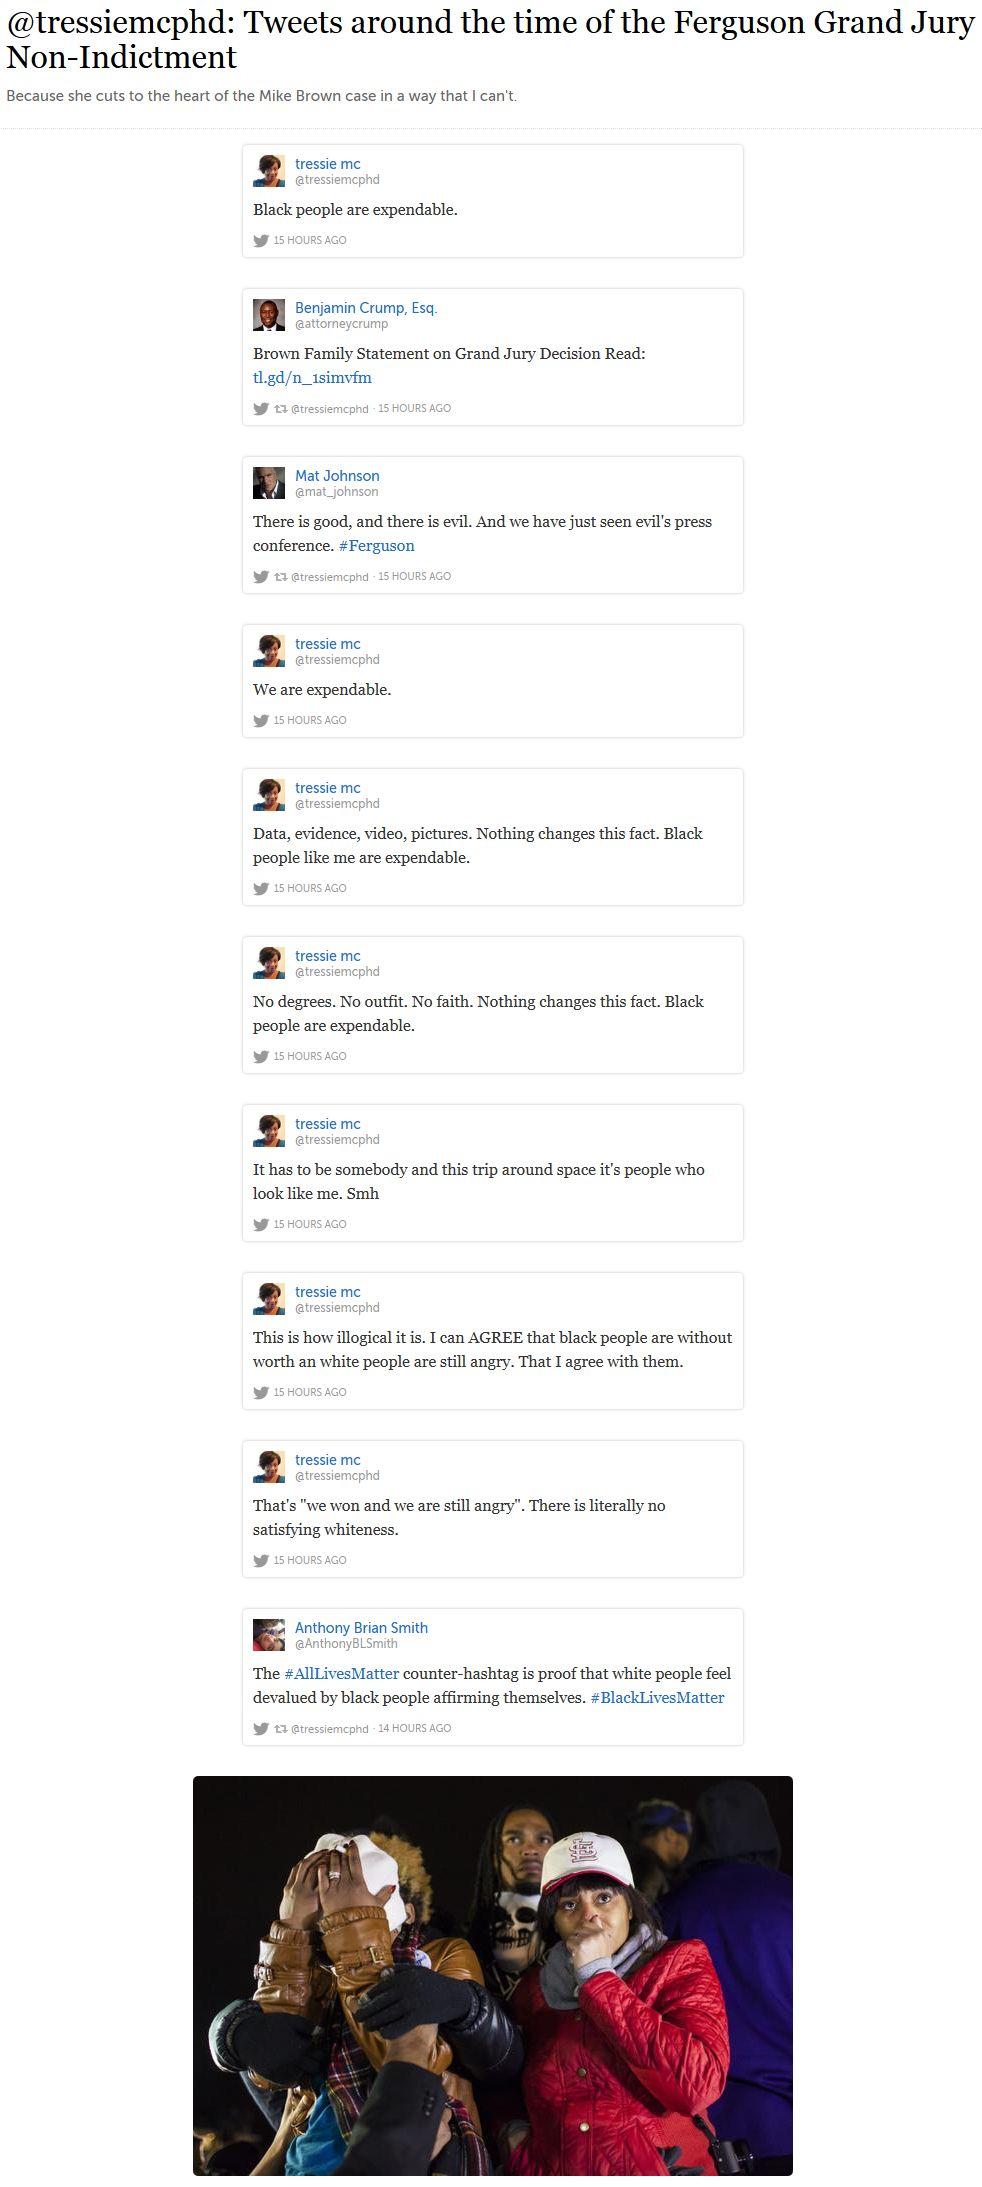 Storify of @tressiemcphd